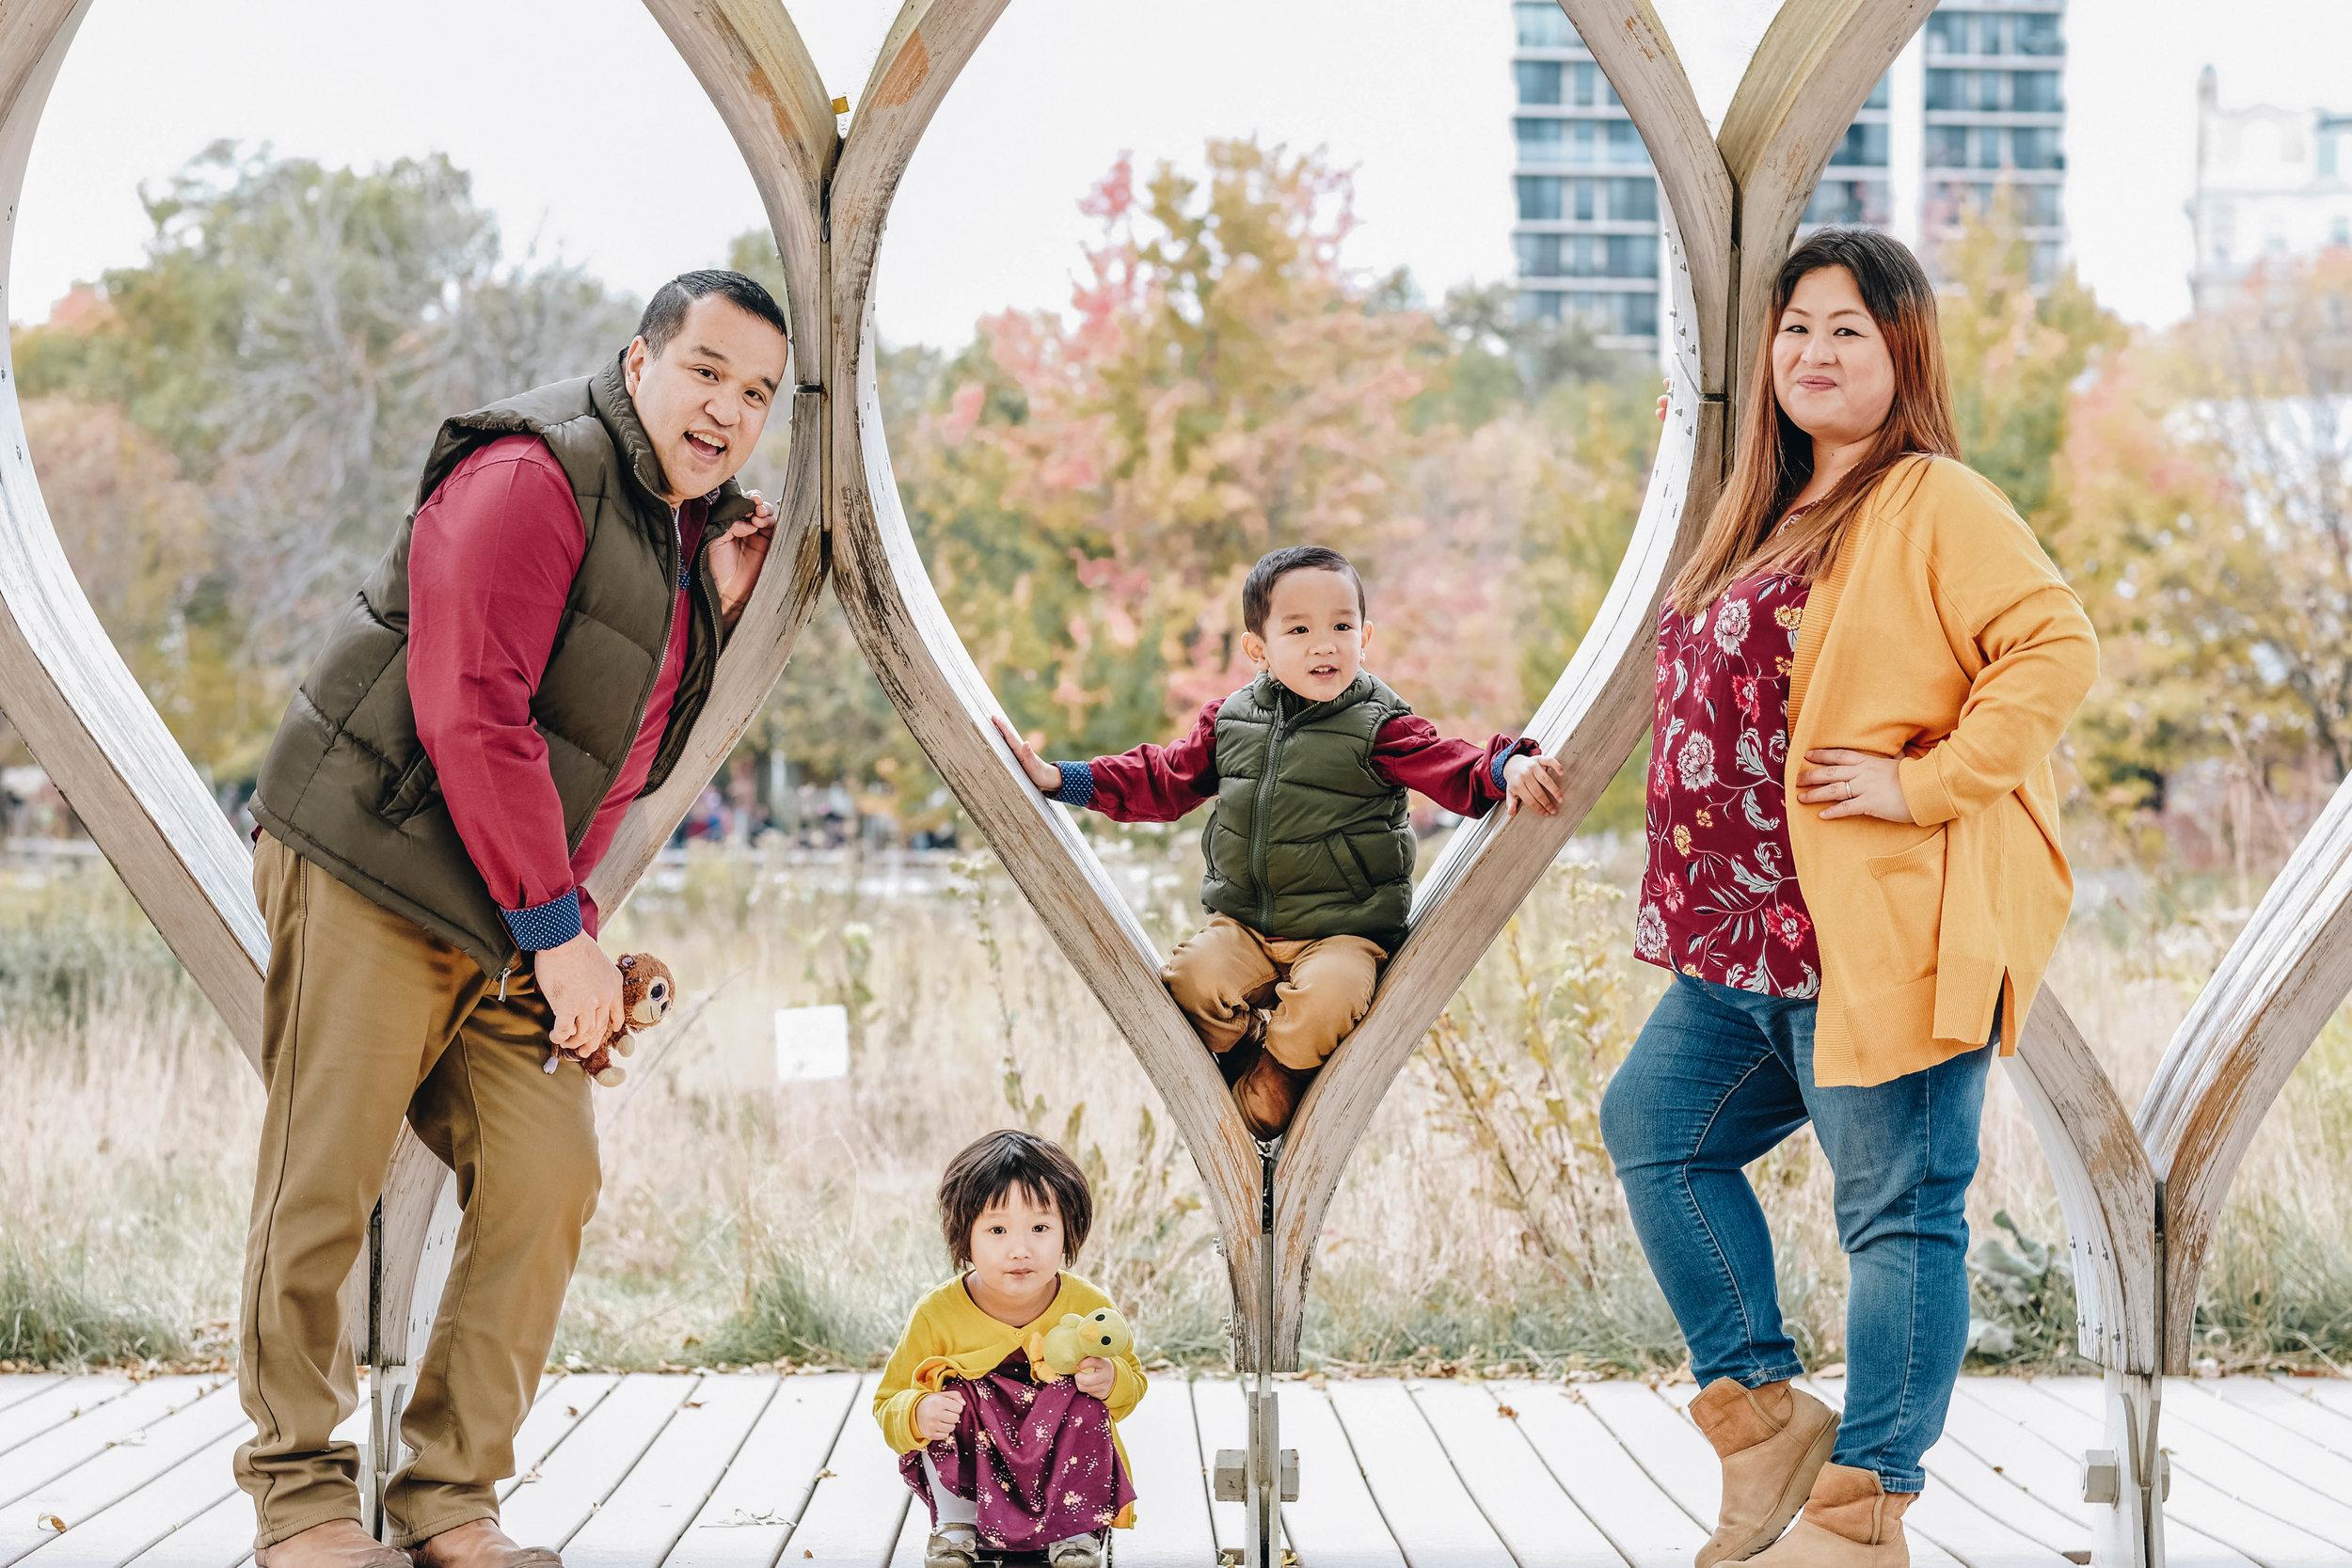 Laroco_Family_October_Web-13.jpg